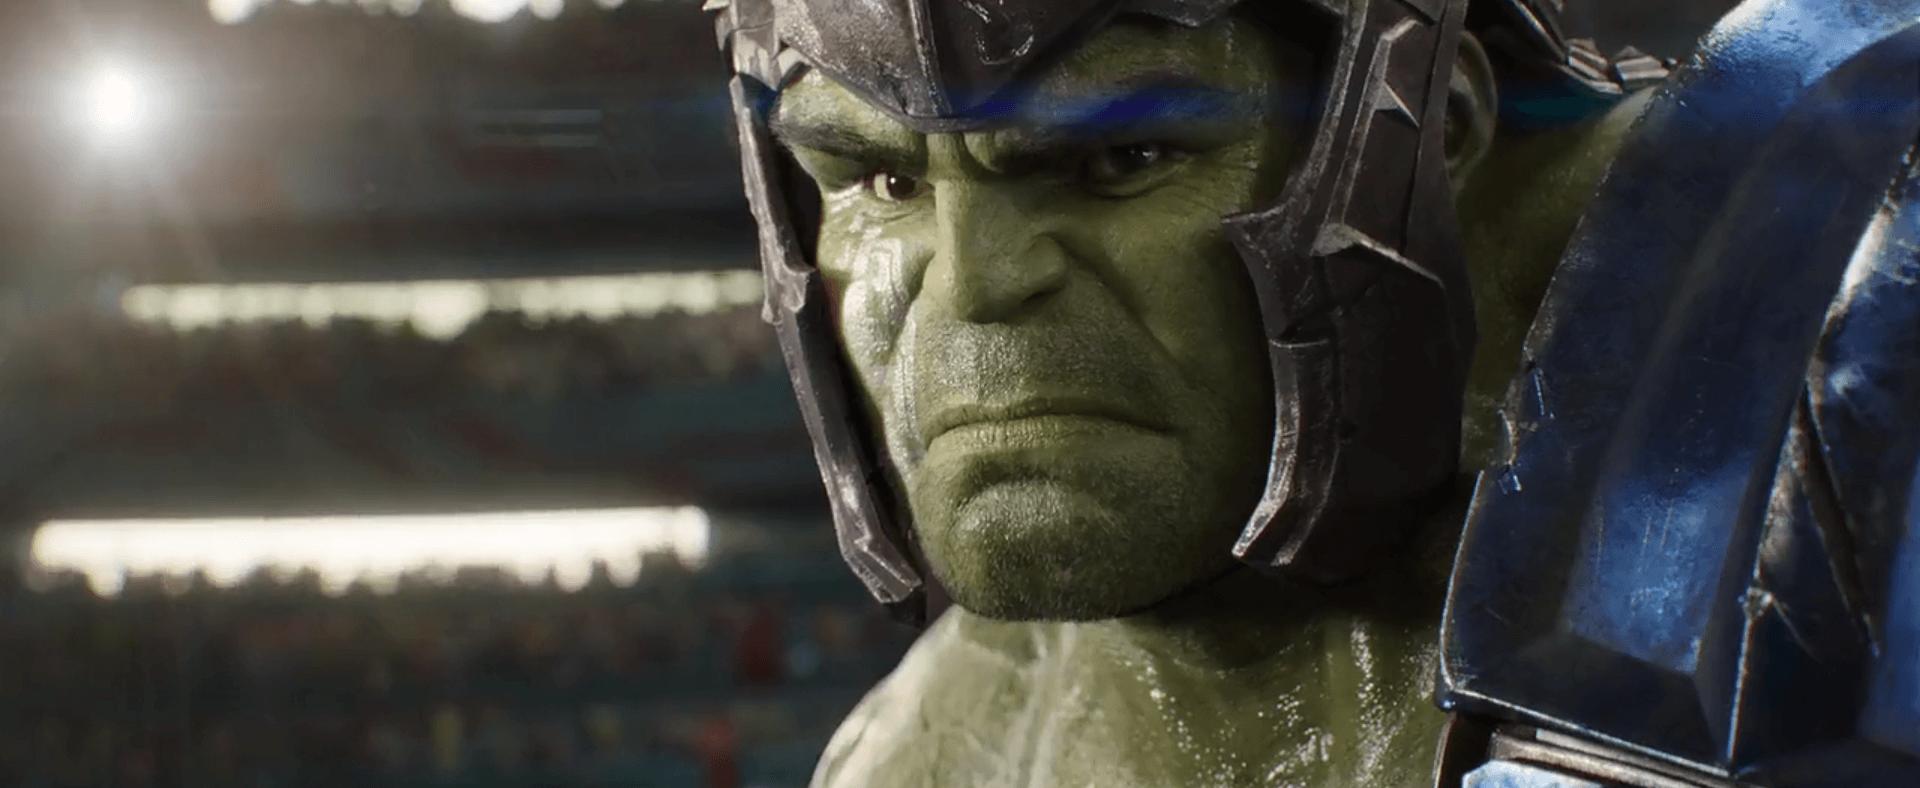 Thor Vs Hulk Wallpapers Wallpaper Cave